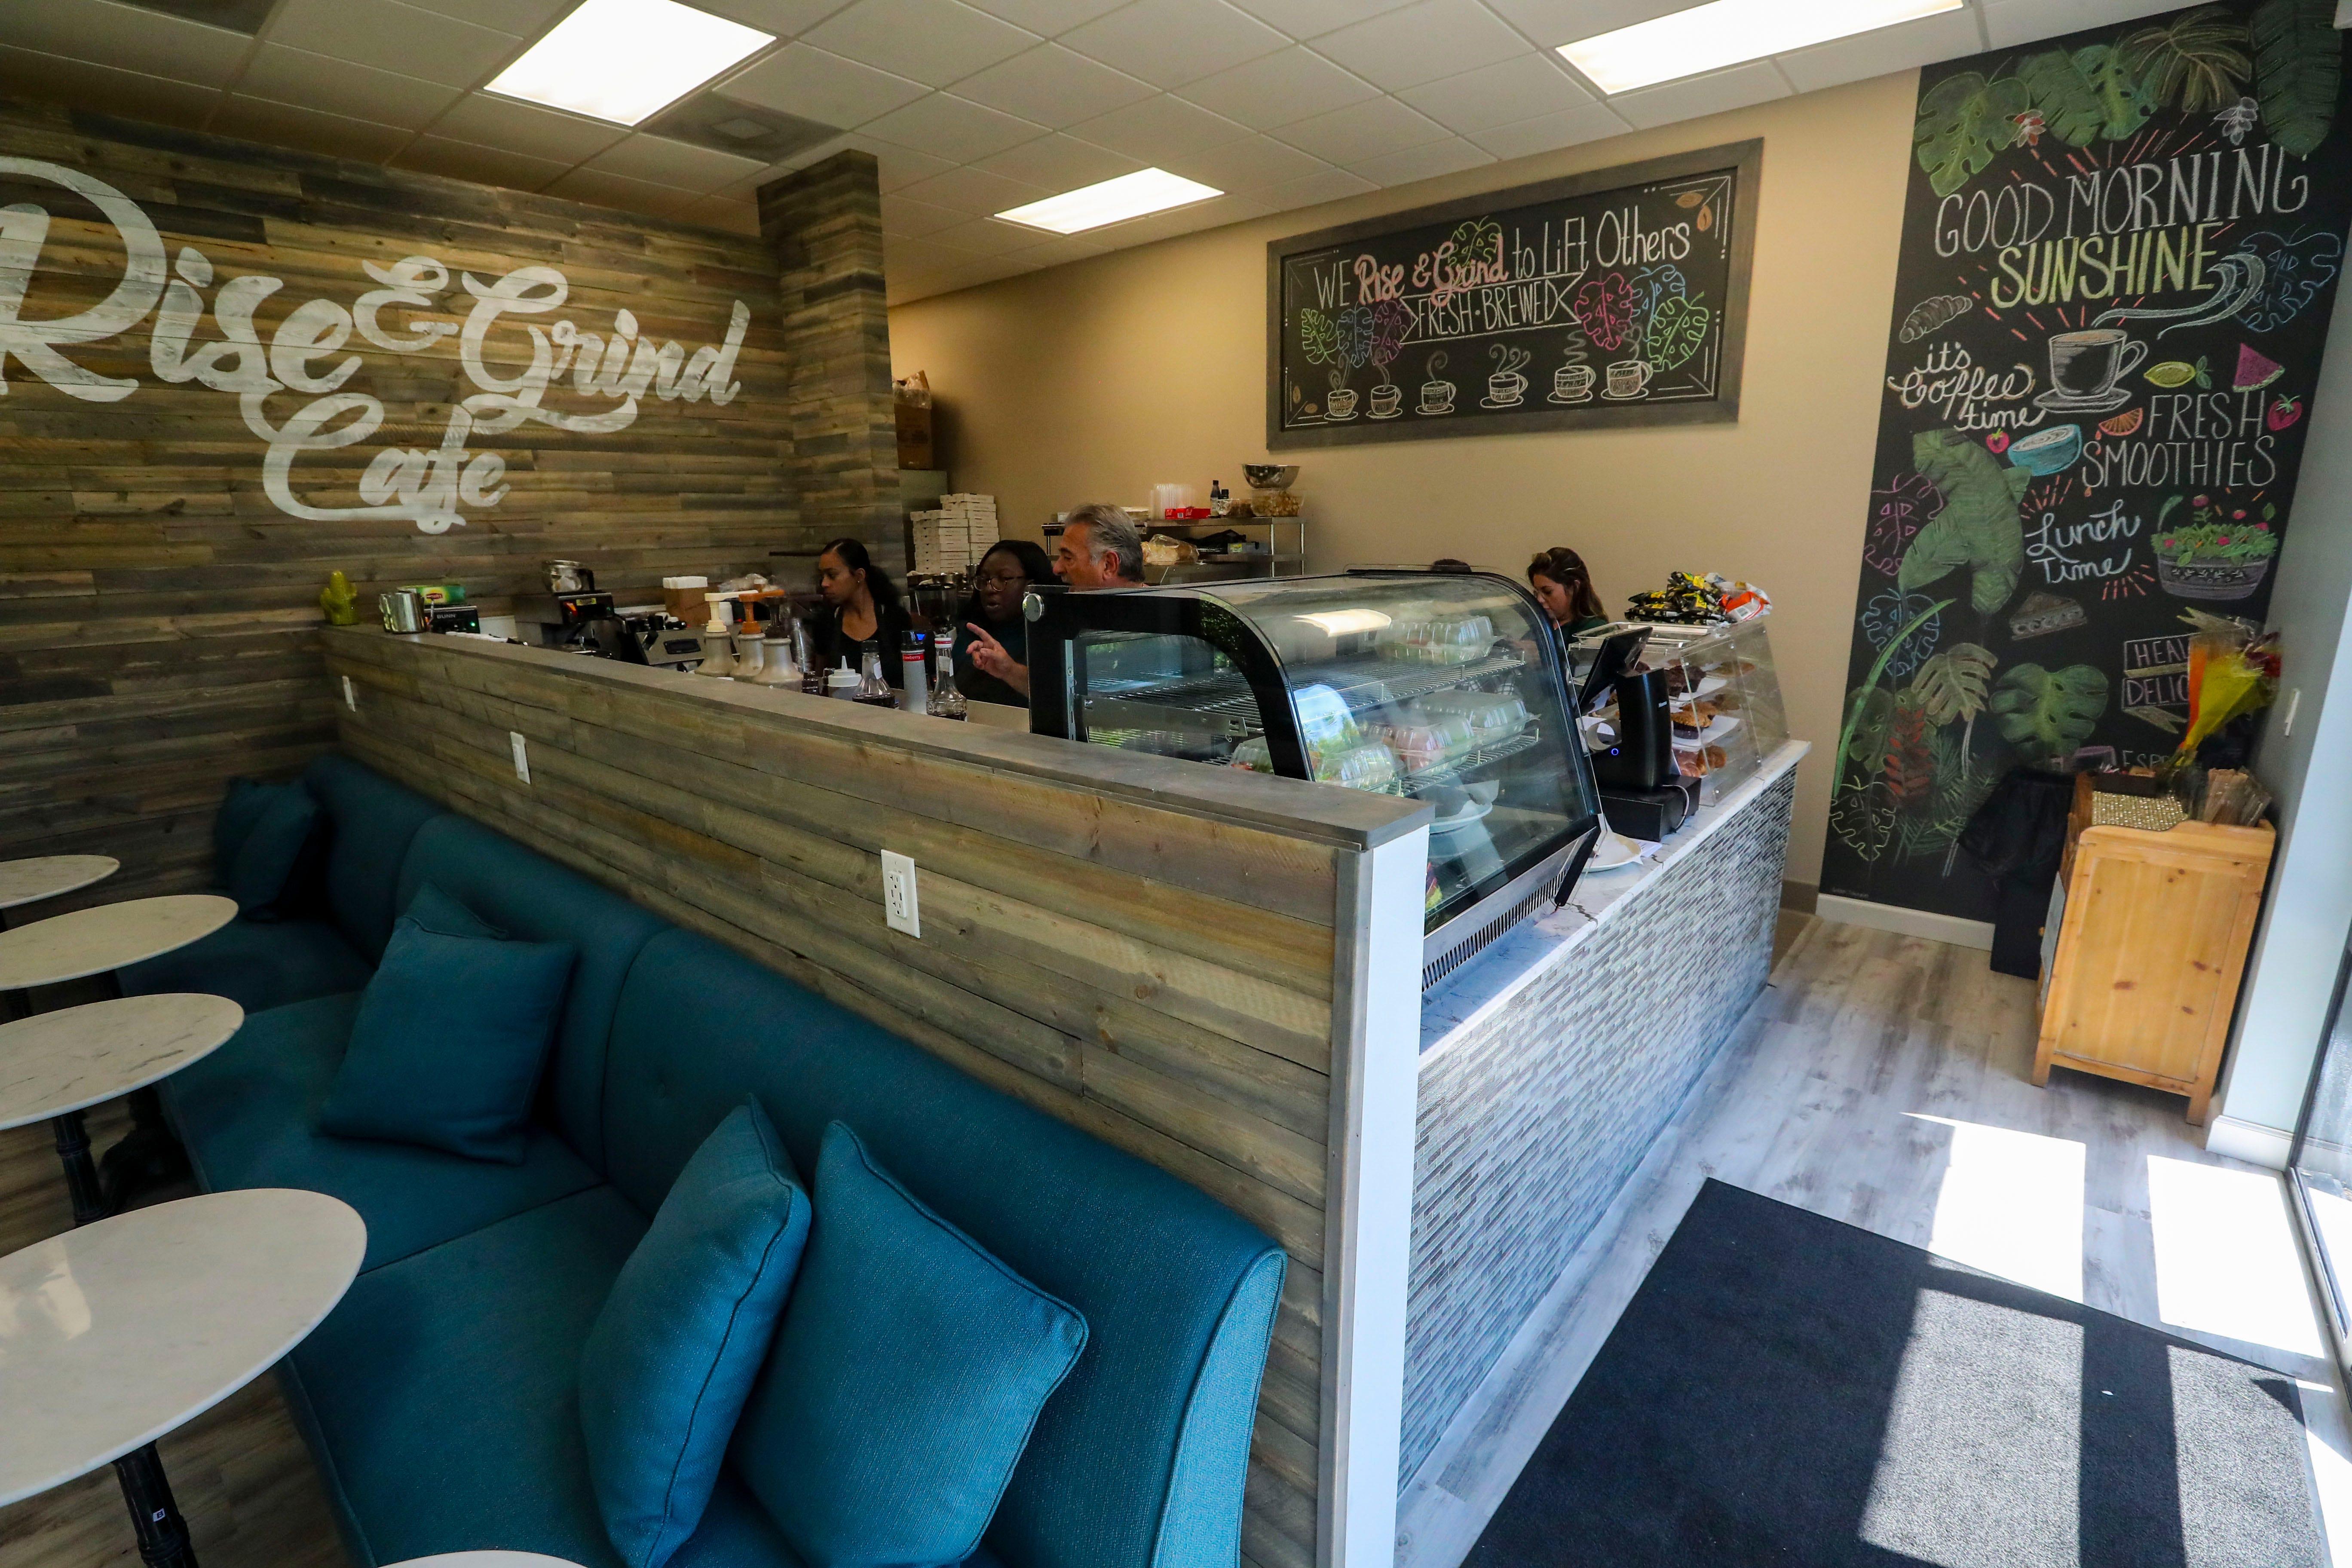 Restaurant News 3 Openings In Estero Bonita Springs One